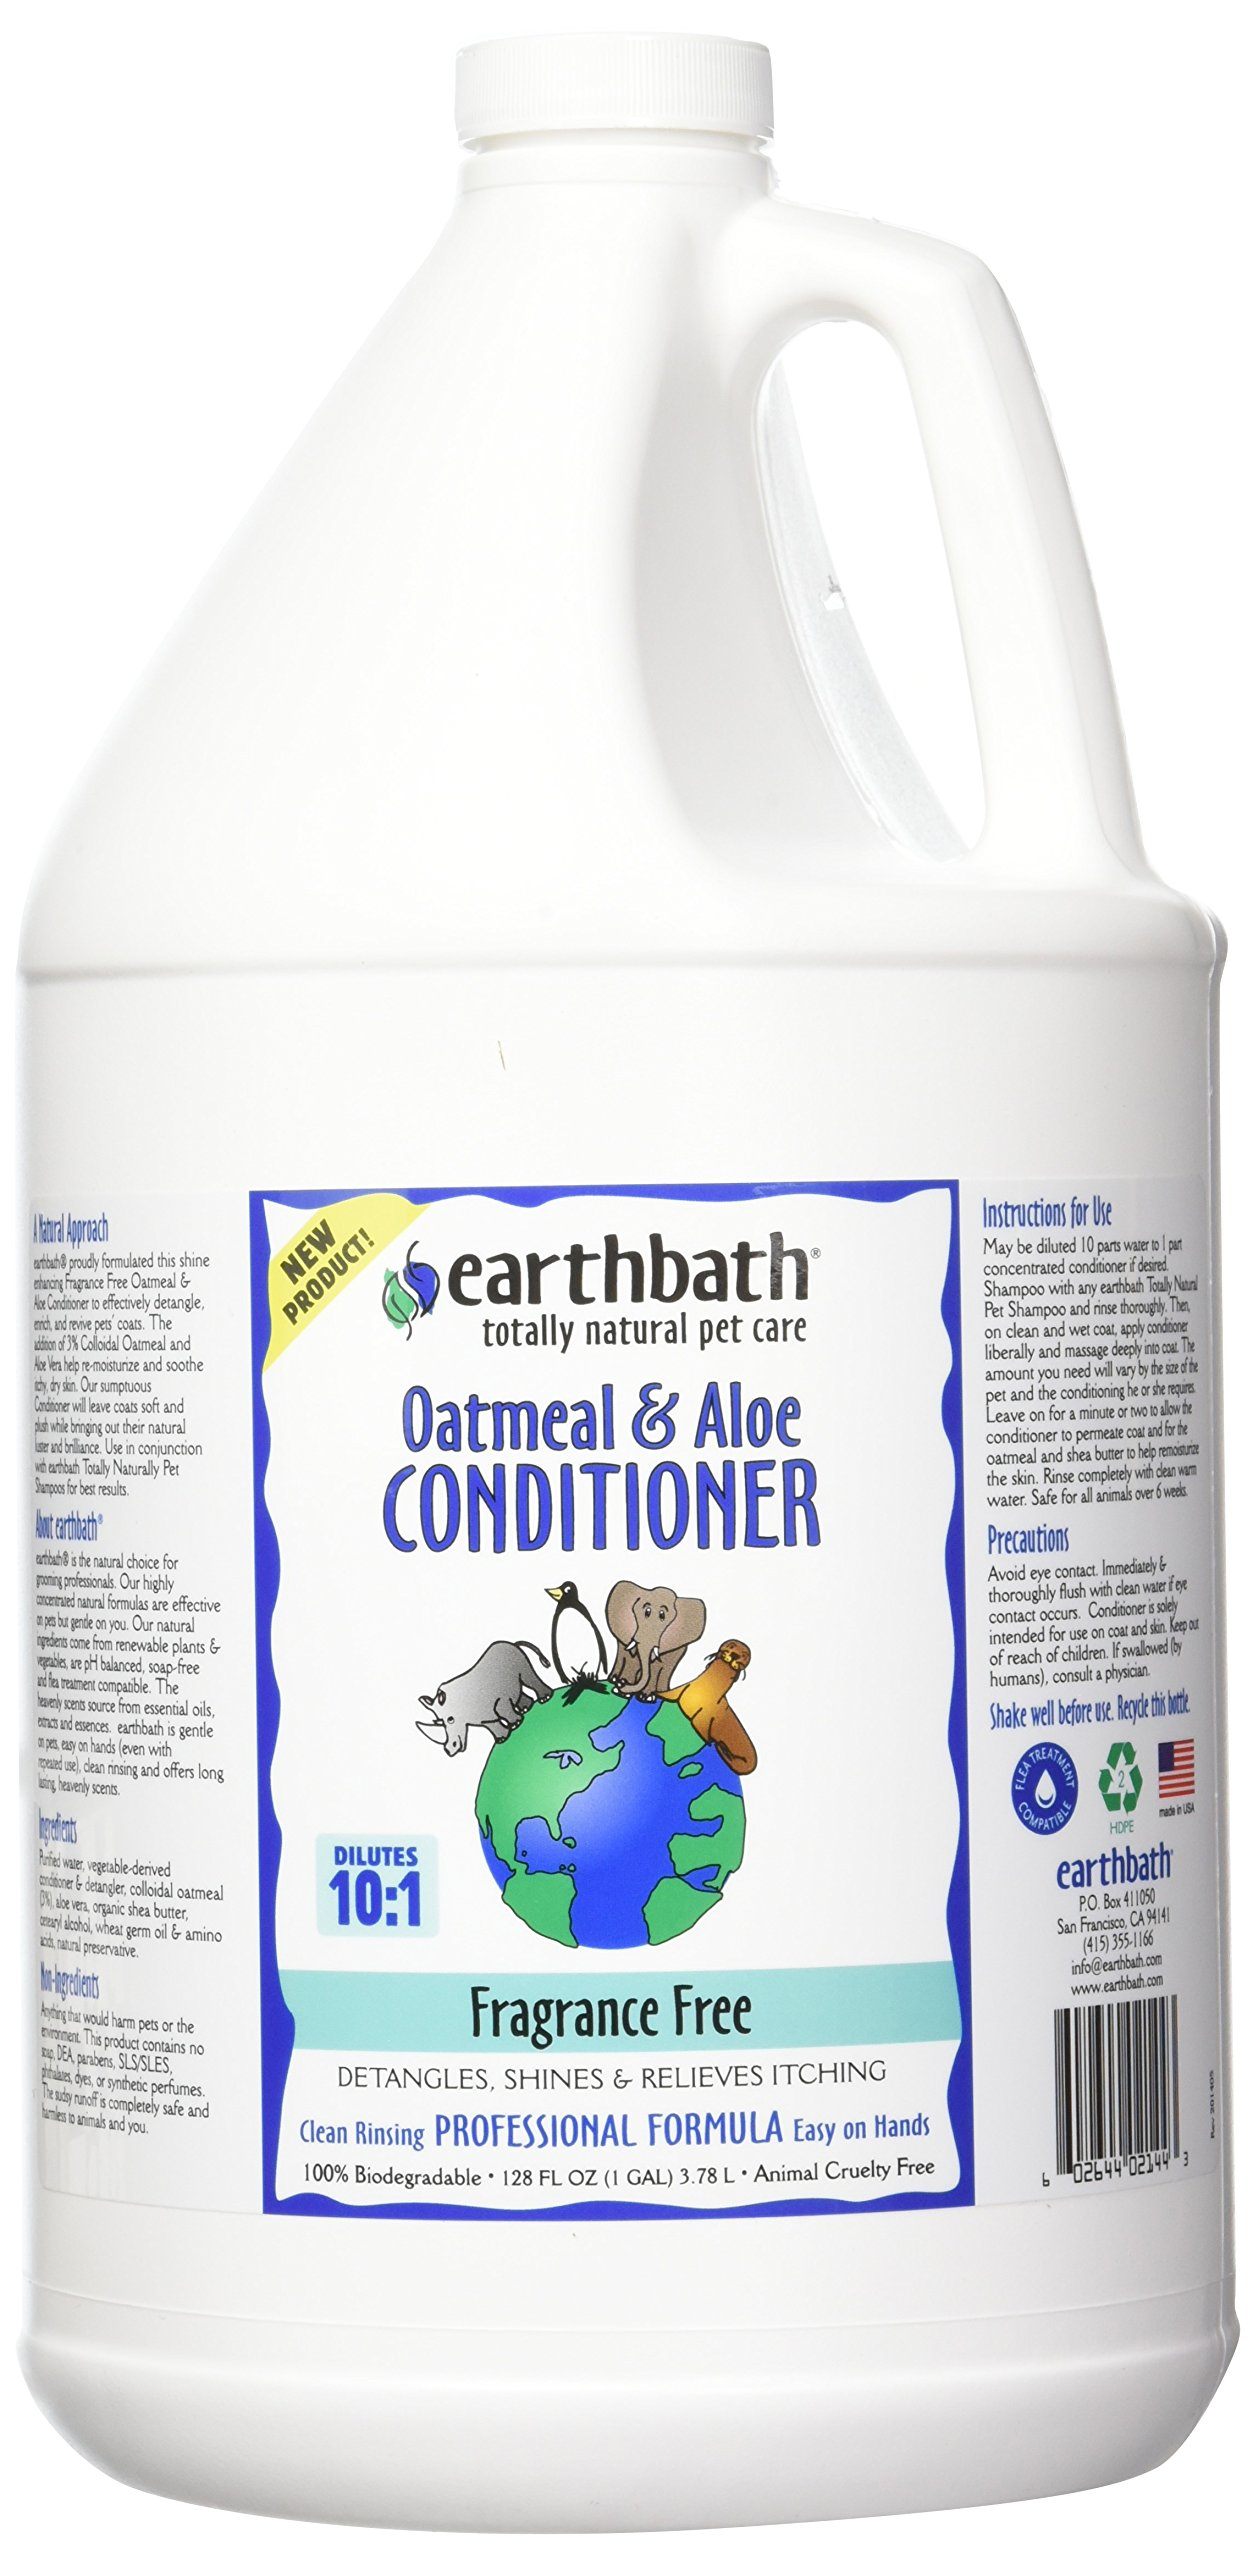 Earthbath Oatmeal & Aloe Conditioner, Fragrance Free 128 oz(1 gal) by Earthbath